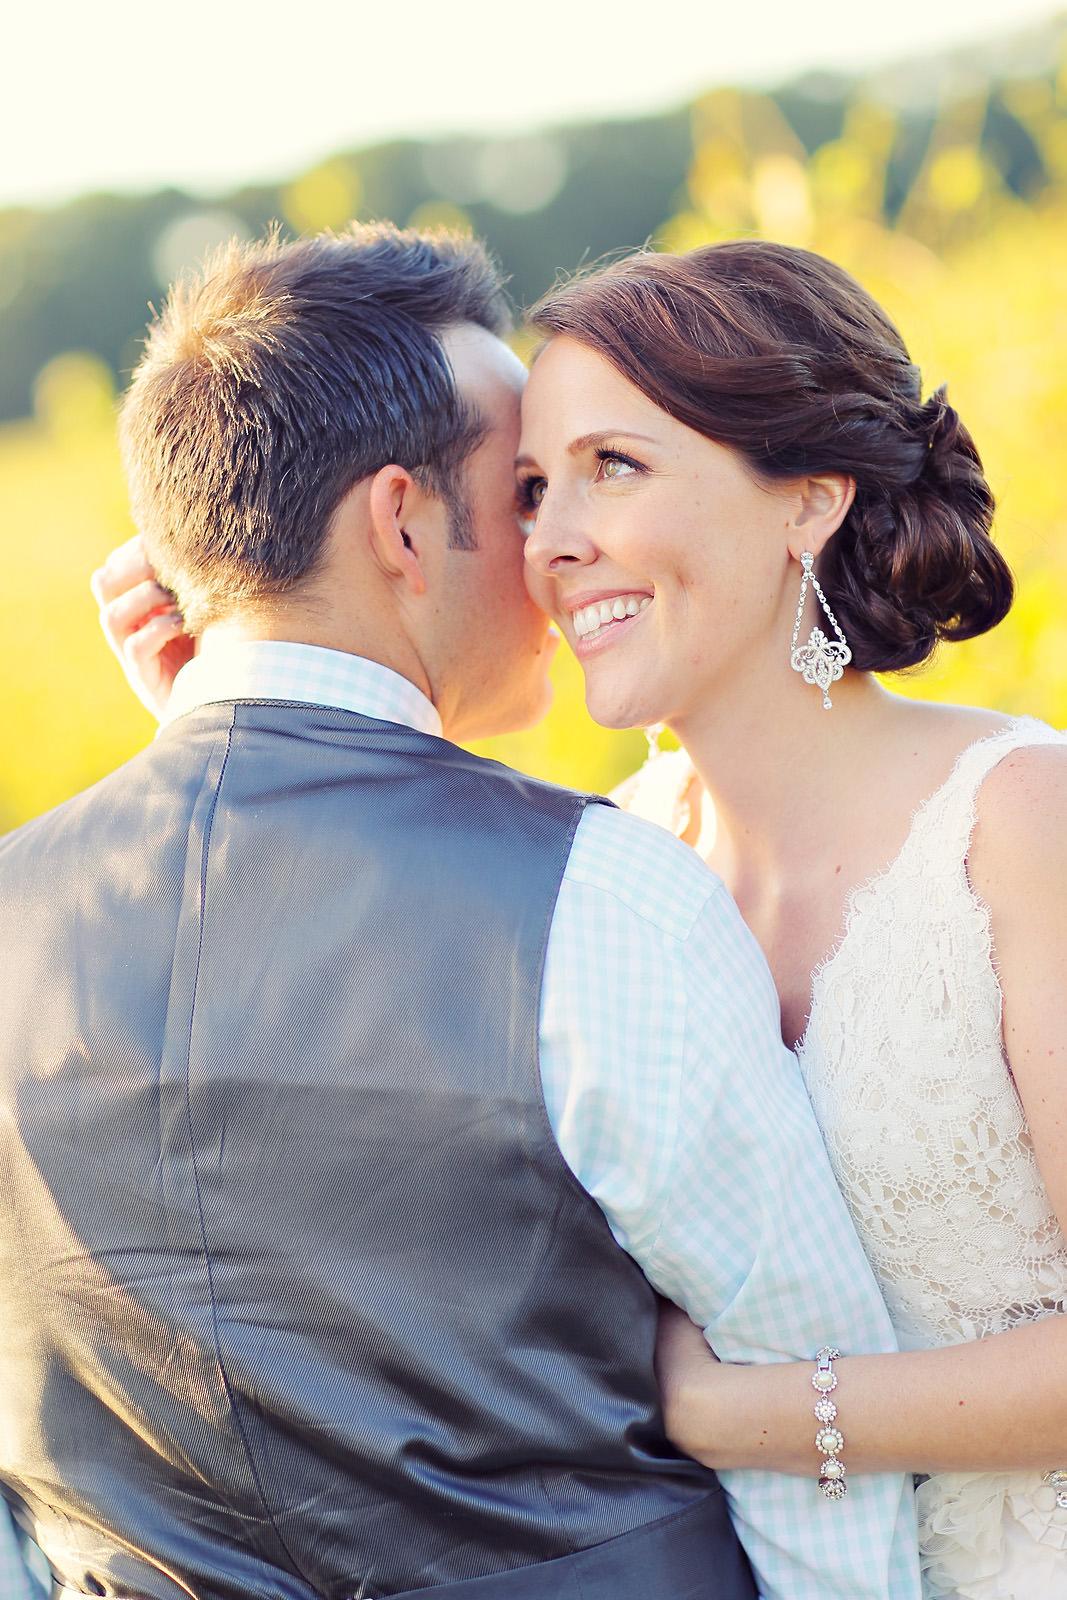 vanessa joy - vanessa joy photographer - pets and weddings - precious moments.jpg